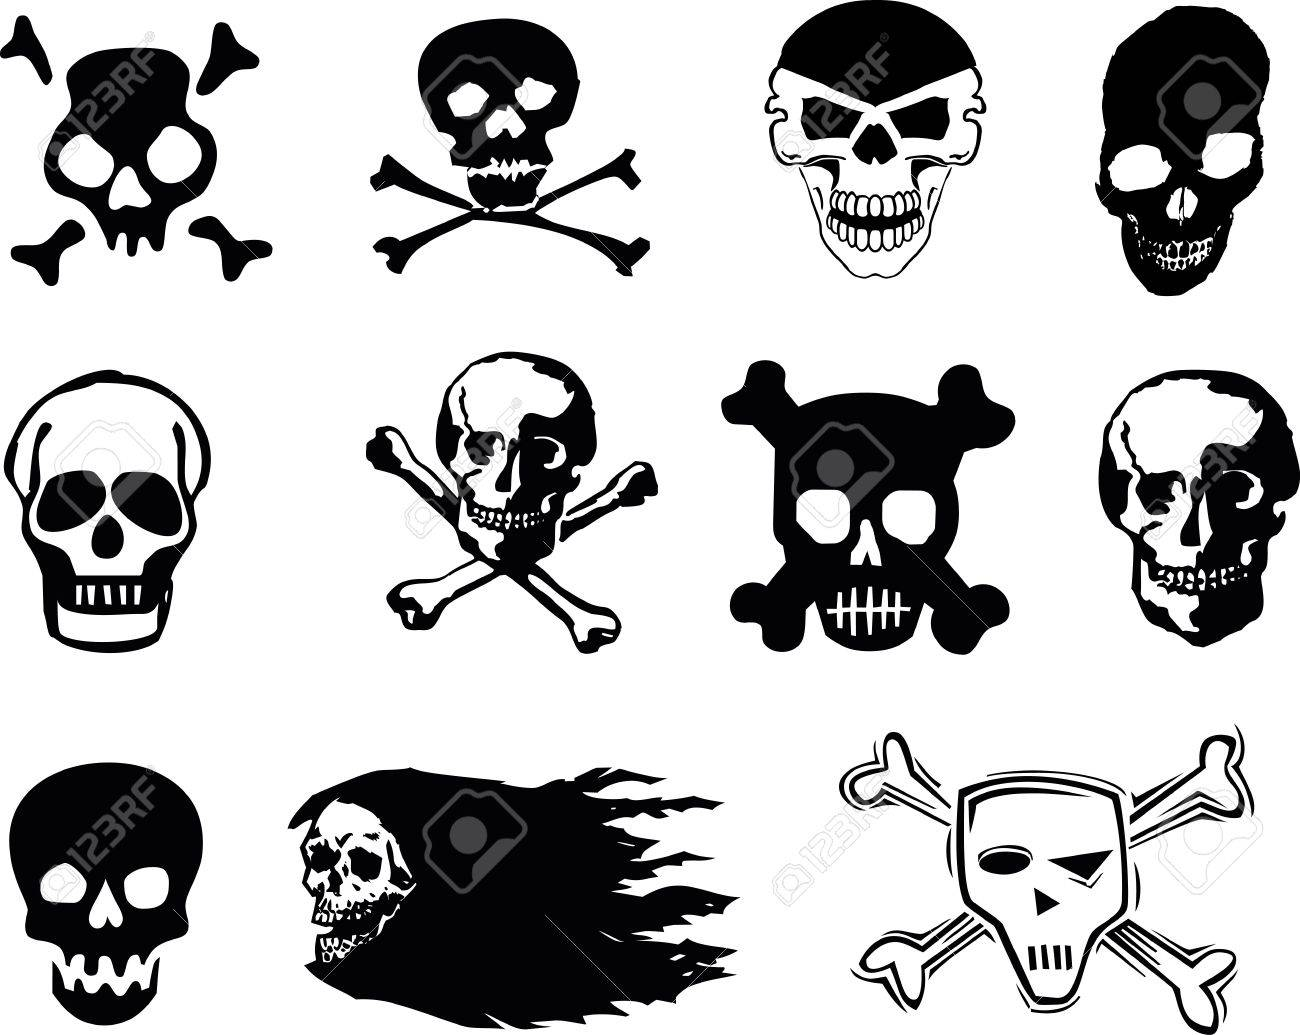 Black skulls on white background Stock Photo - 13456860